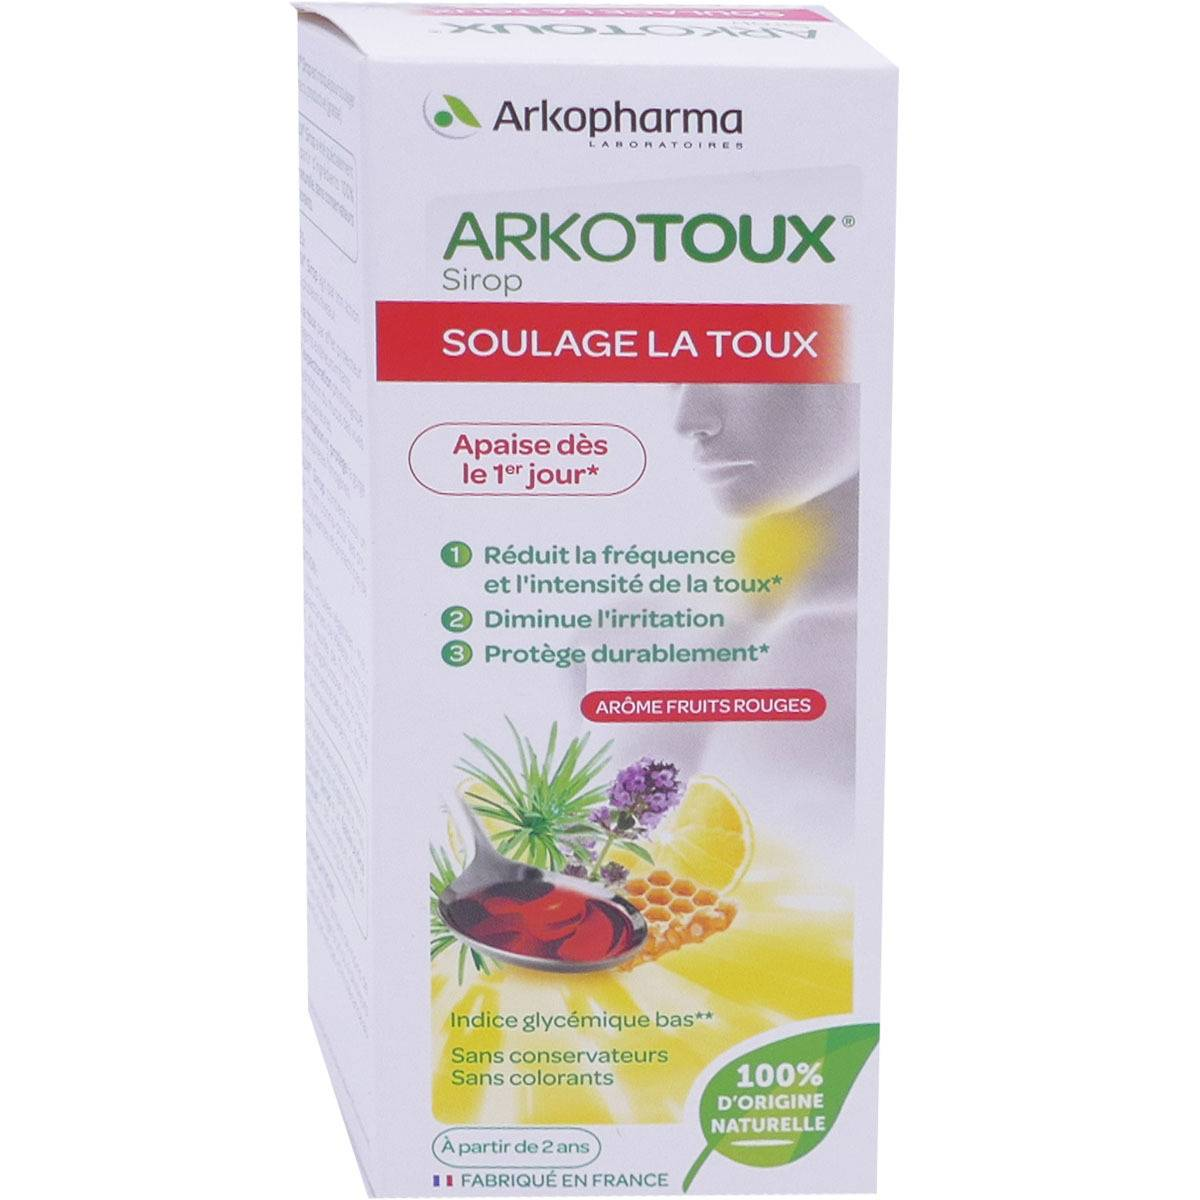 Arkopharma arkotoux sirop soulage la  toux 140 ml